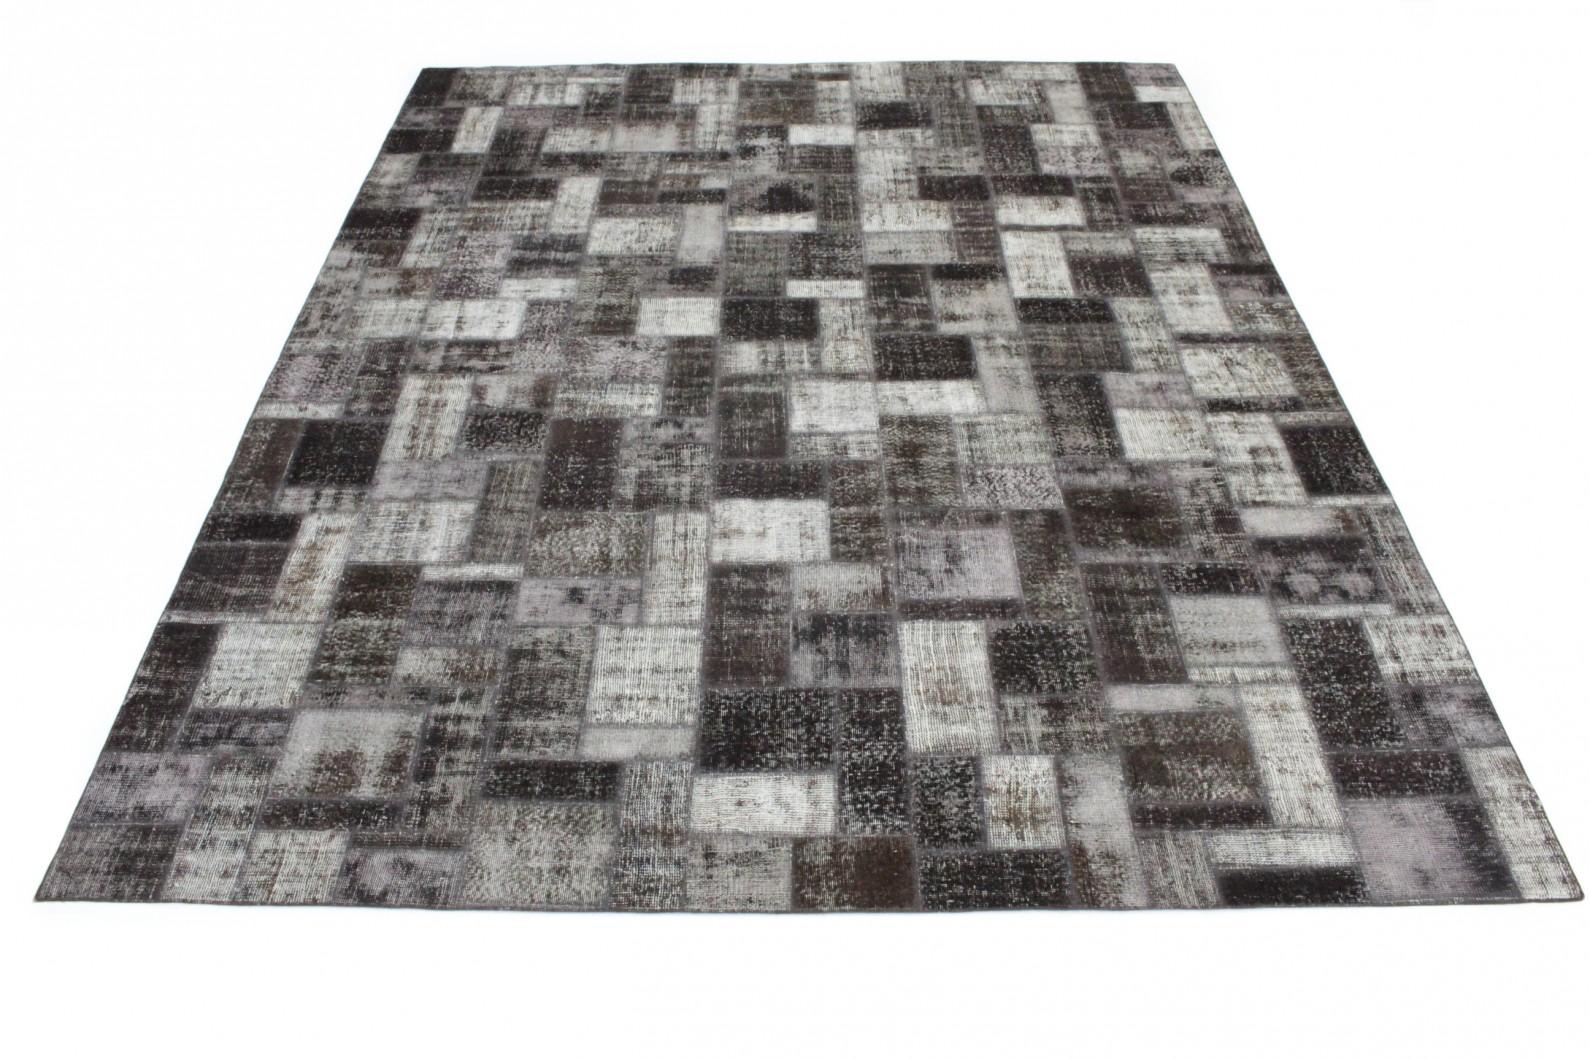 Patchwork Teppich Grau Schwarz in 400x310